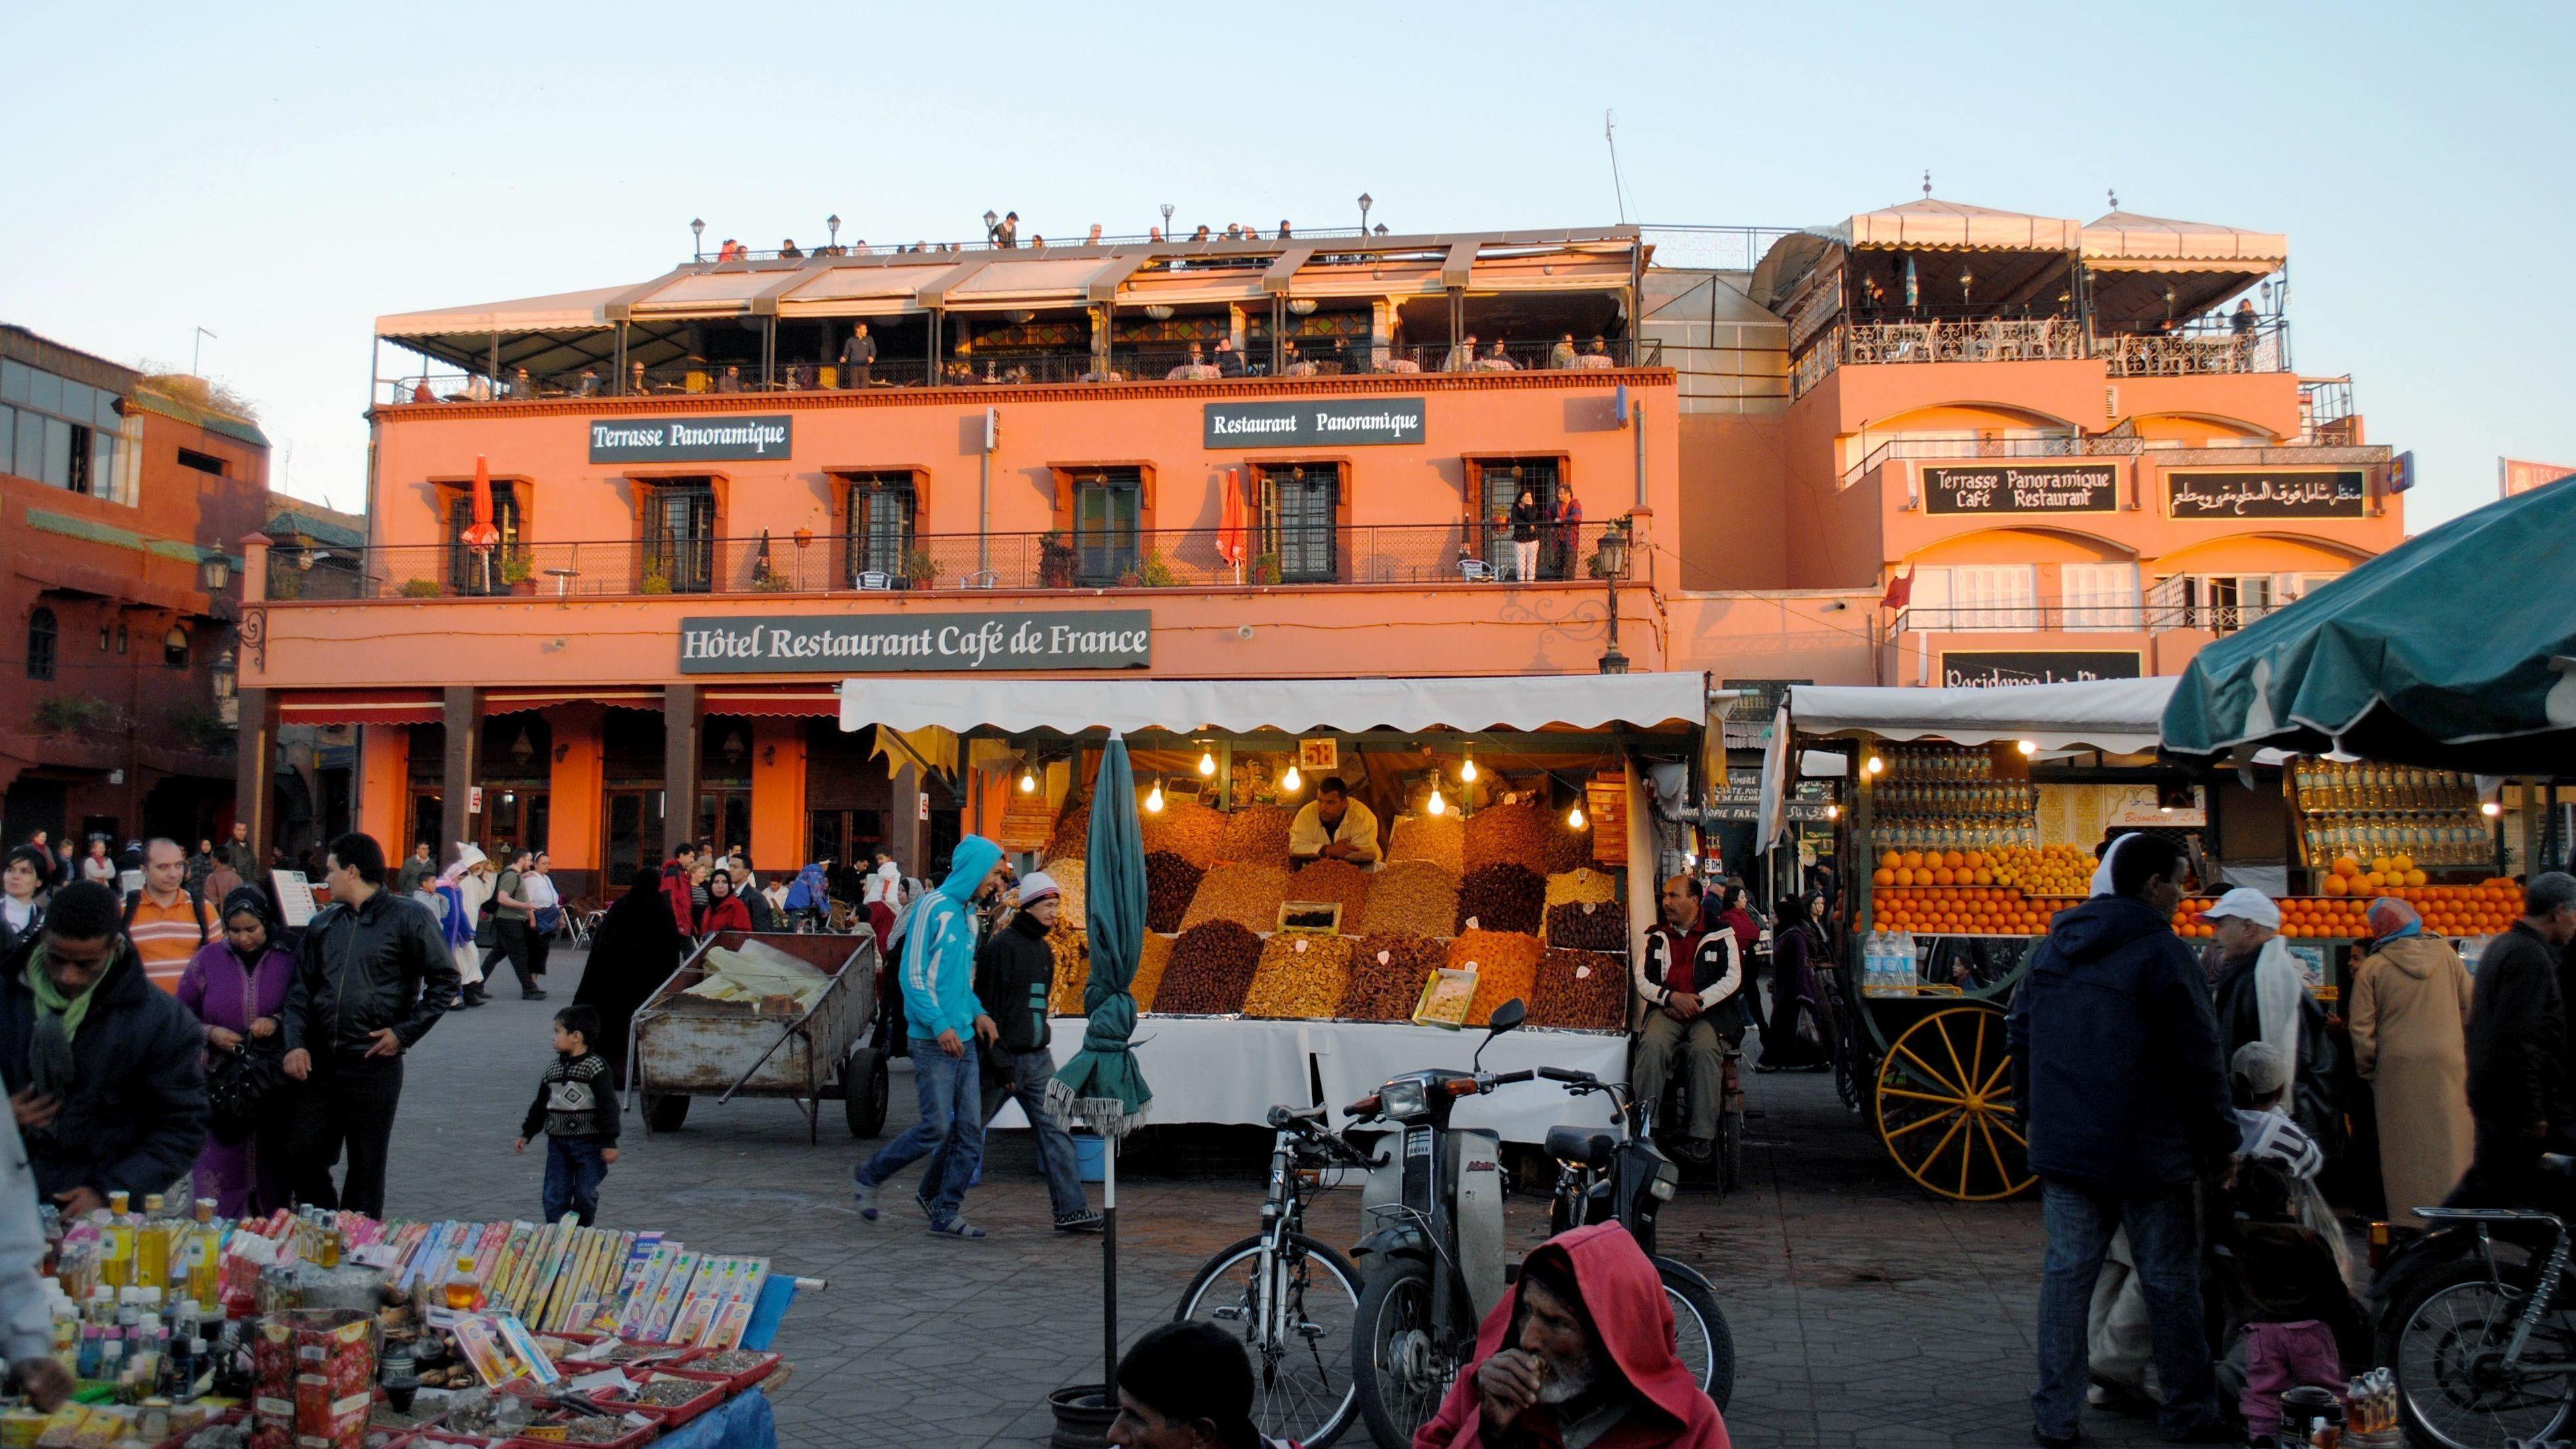 Market stalls and nearby restaurants in Marrakech